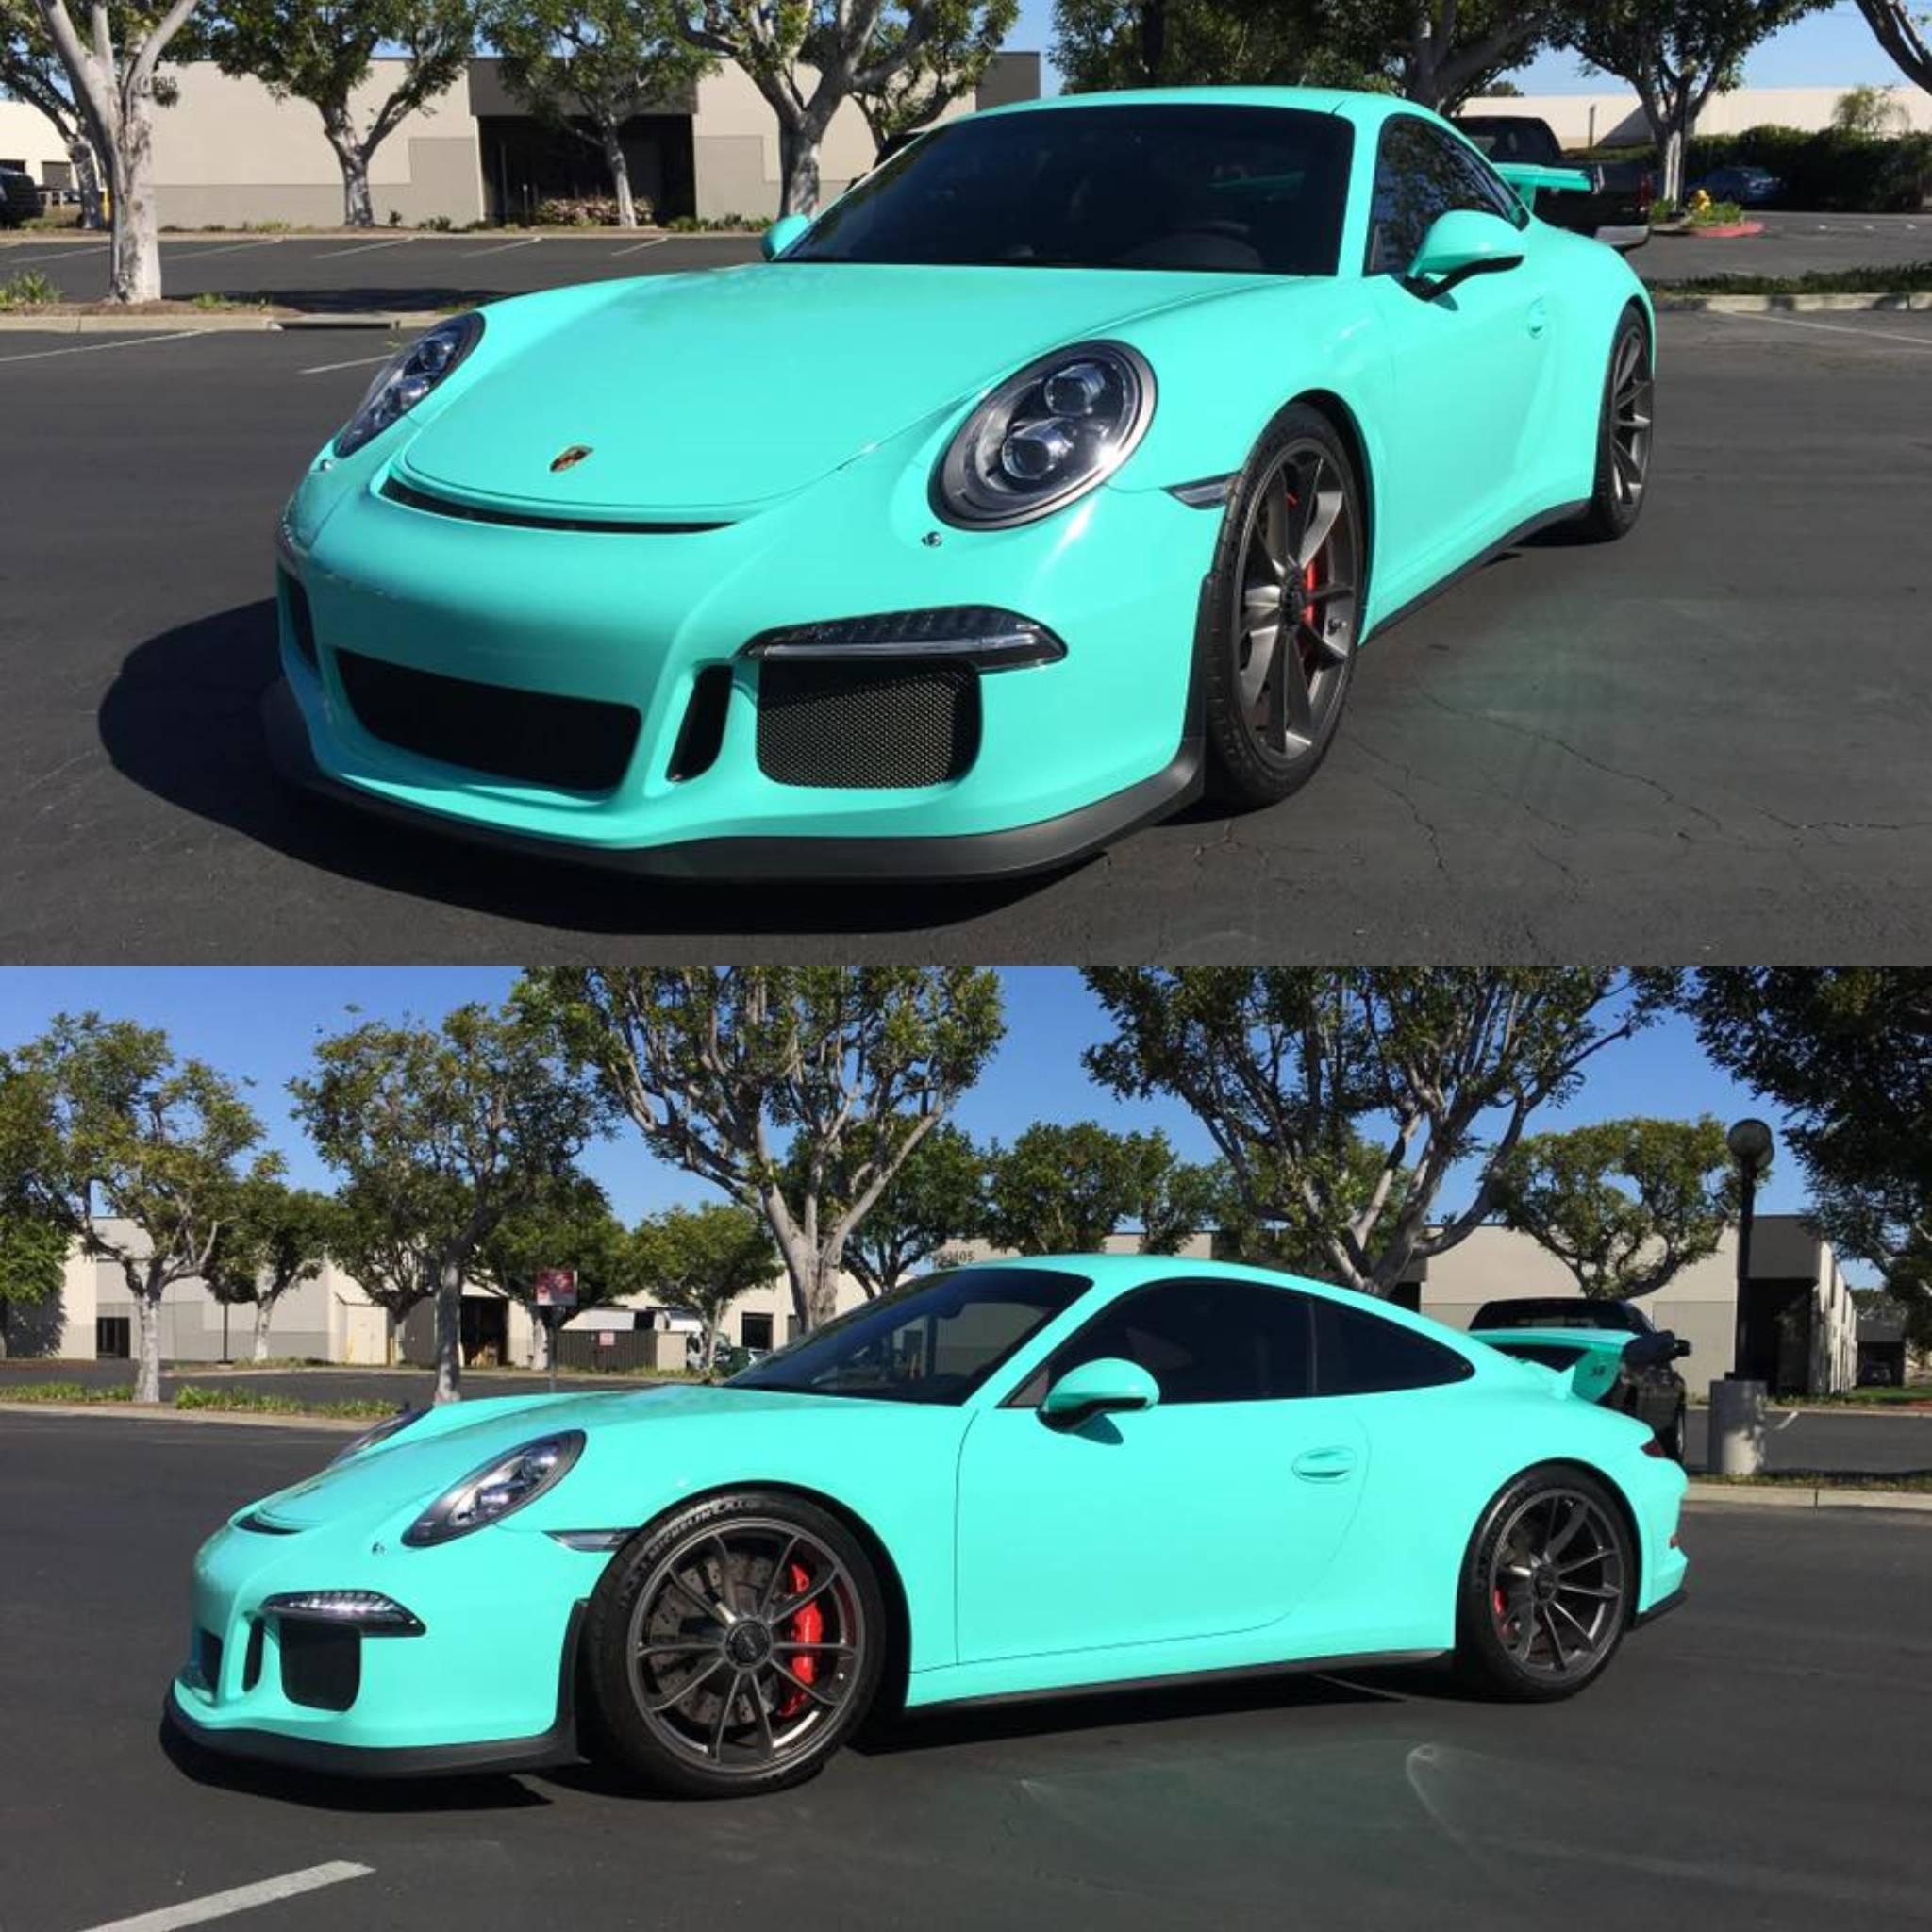 Epic Tiffany Blue Wrapped Porsche 911 GT3